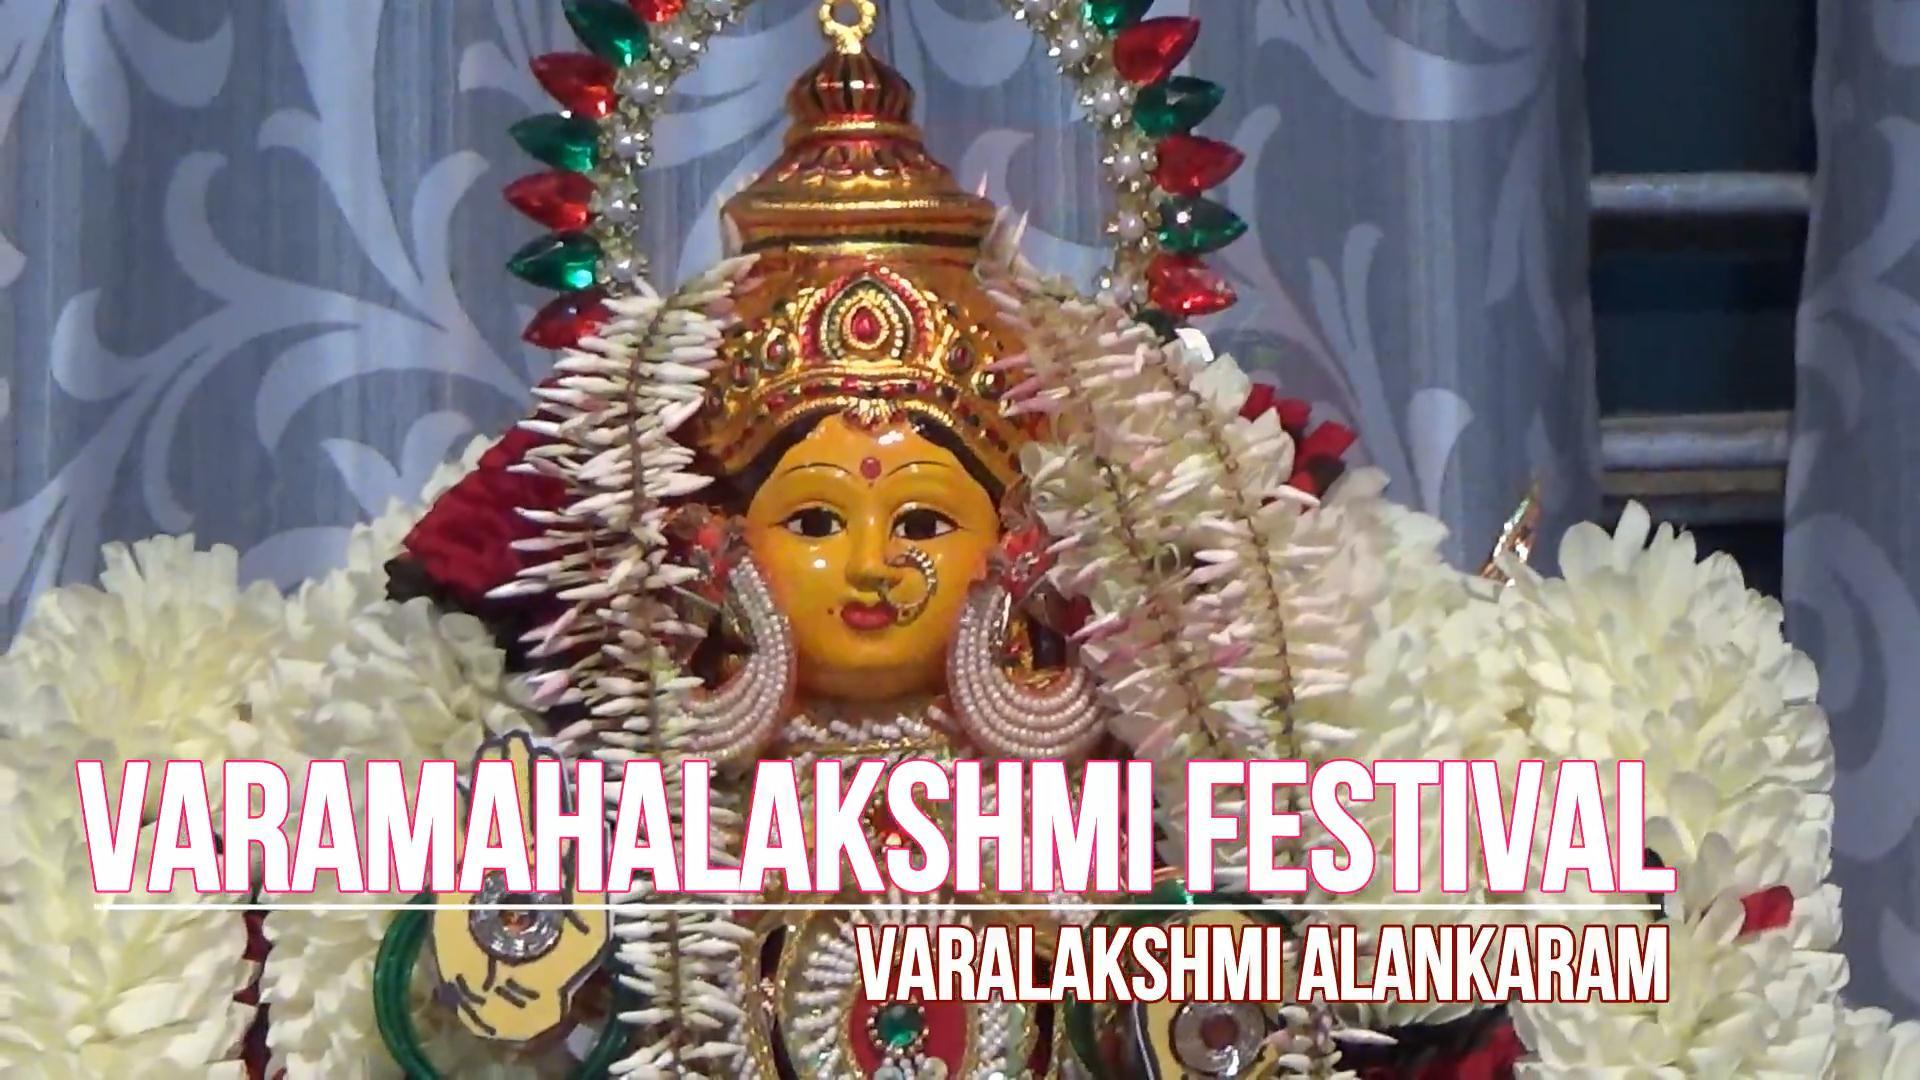 Decoration Of Goddess Varamahalakshmi for the festival of Varalakshmi Vratham.